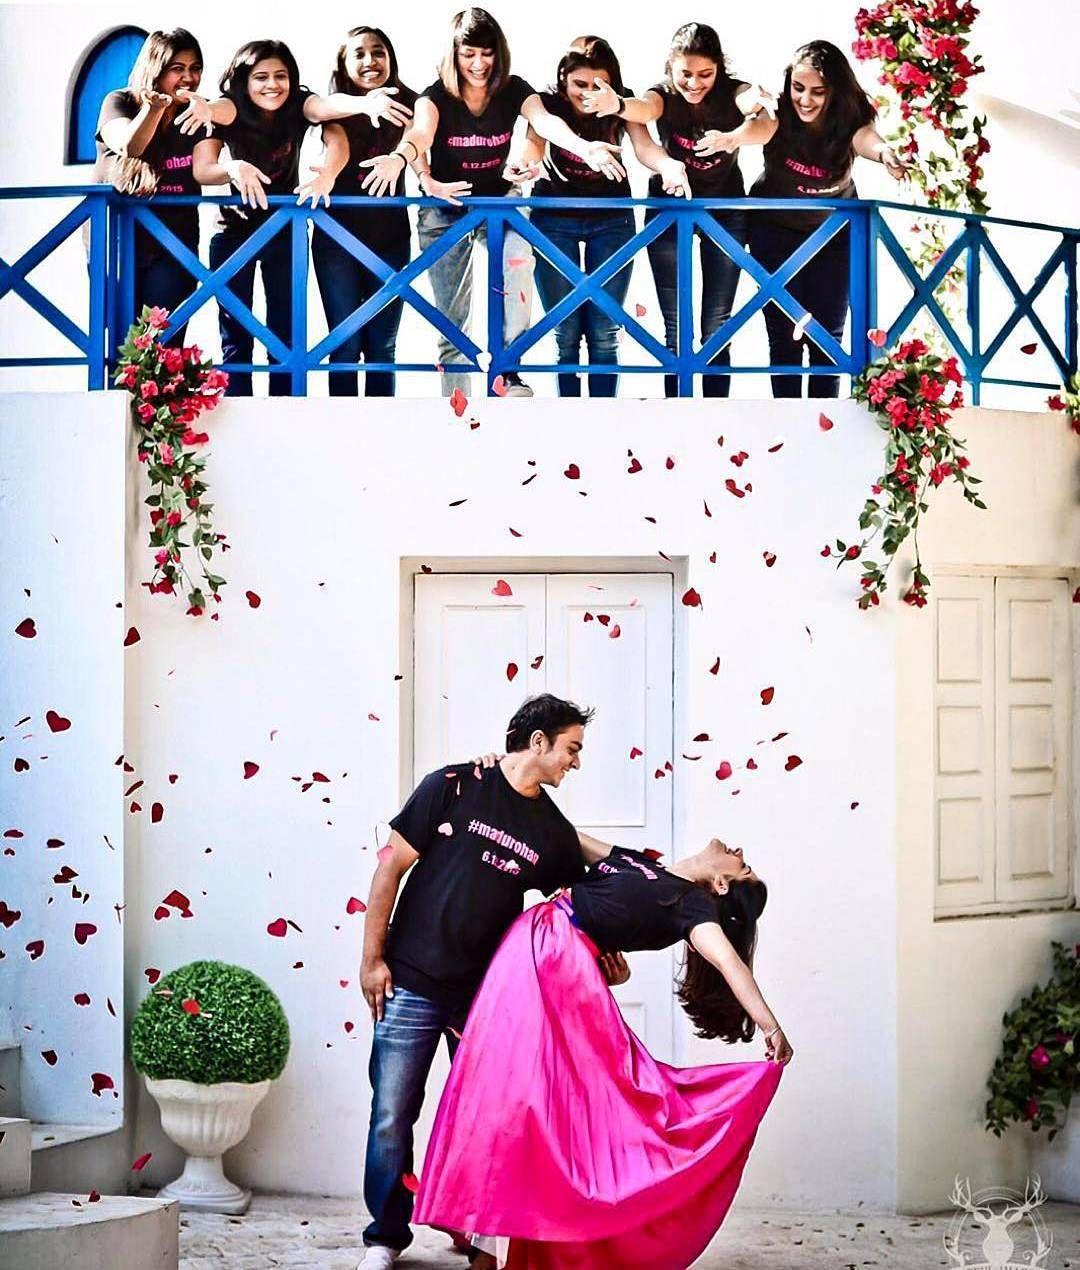 We needs a great team to create a stunning shot...A beautiful moment was created by @morvi_images #bigindianwedding #indianwedding #weddingphotography #photographyideas #photographyinspiration #bridesmaids #preweddingshoot